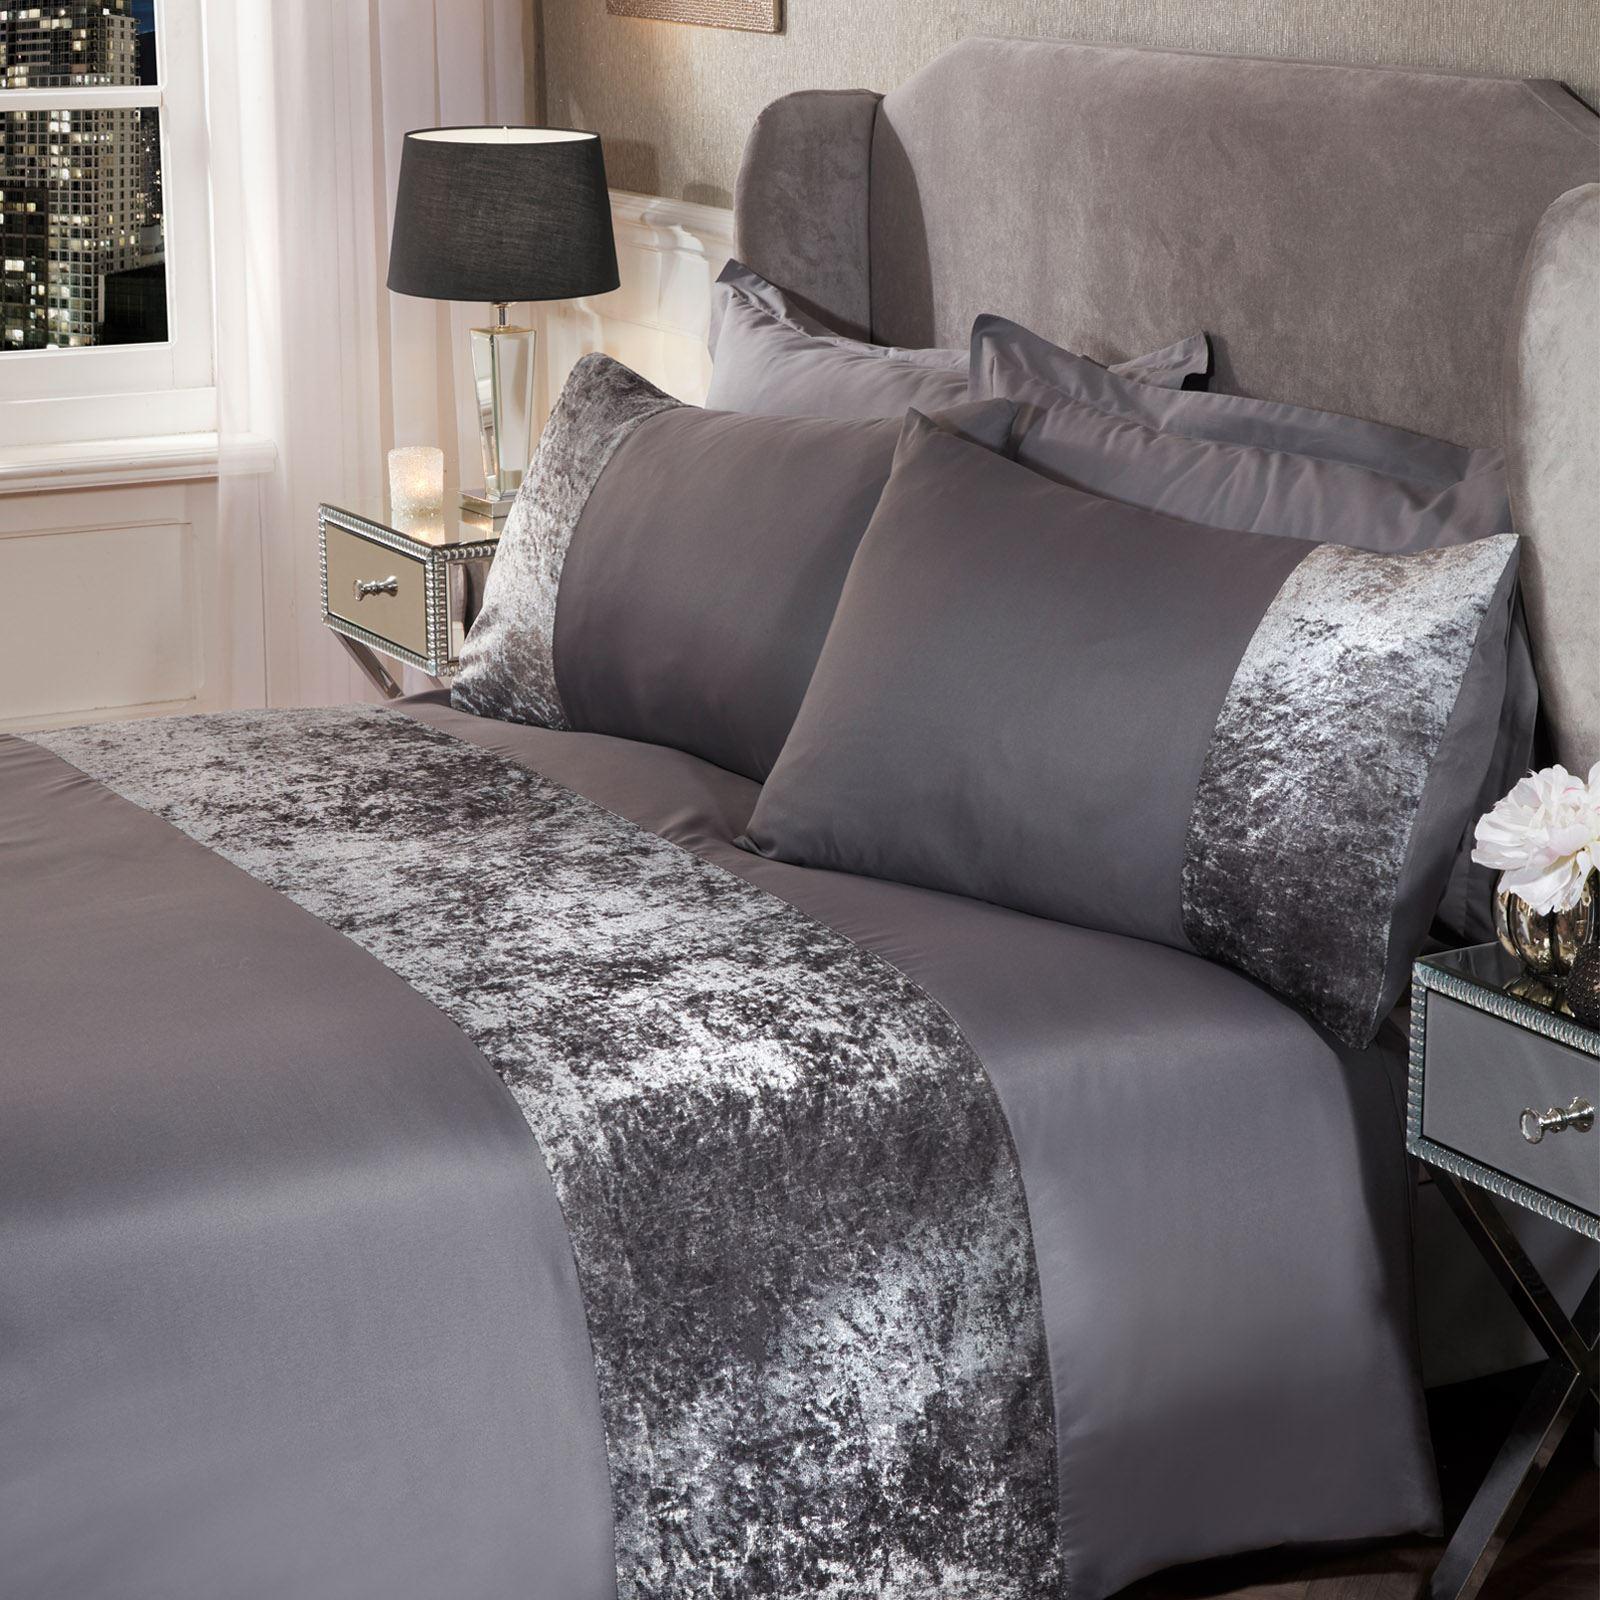 thumbnail 30 - Sienna Crushed Velvet Panel Duvet Cover with Pillow Case Bedding Set Silver Grey